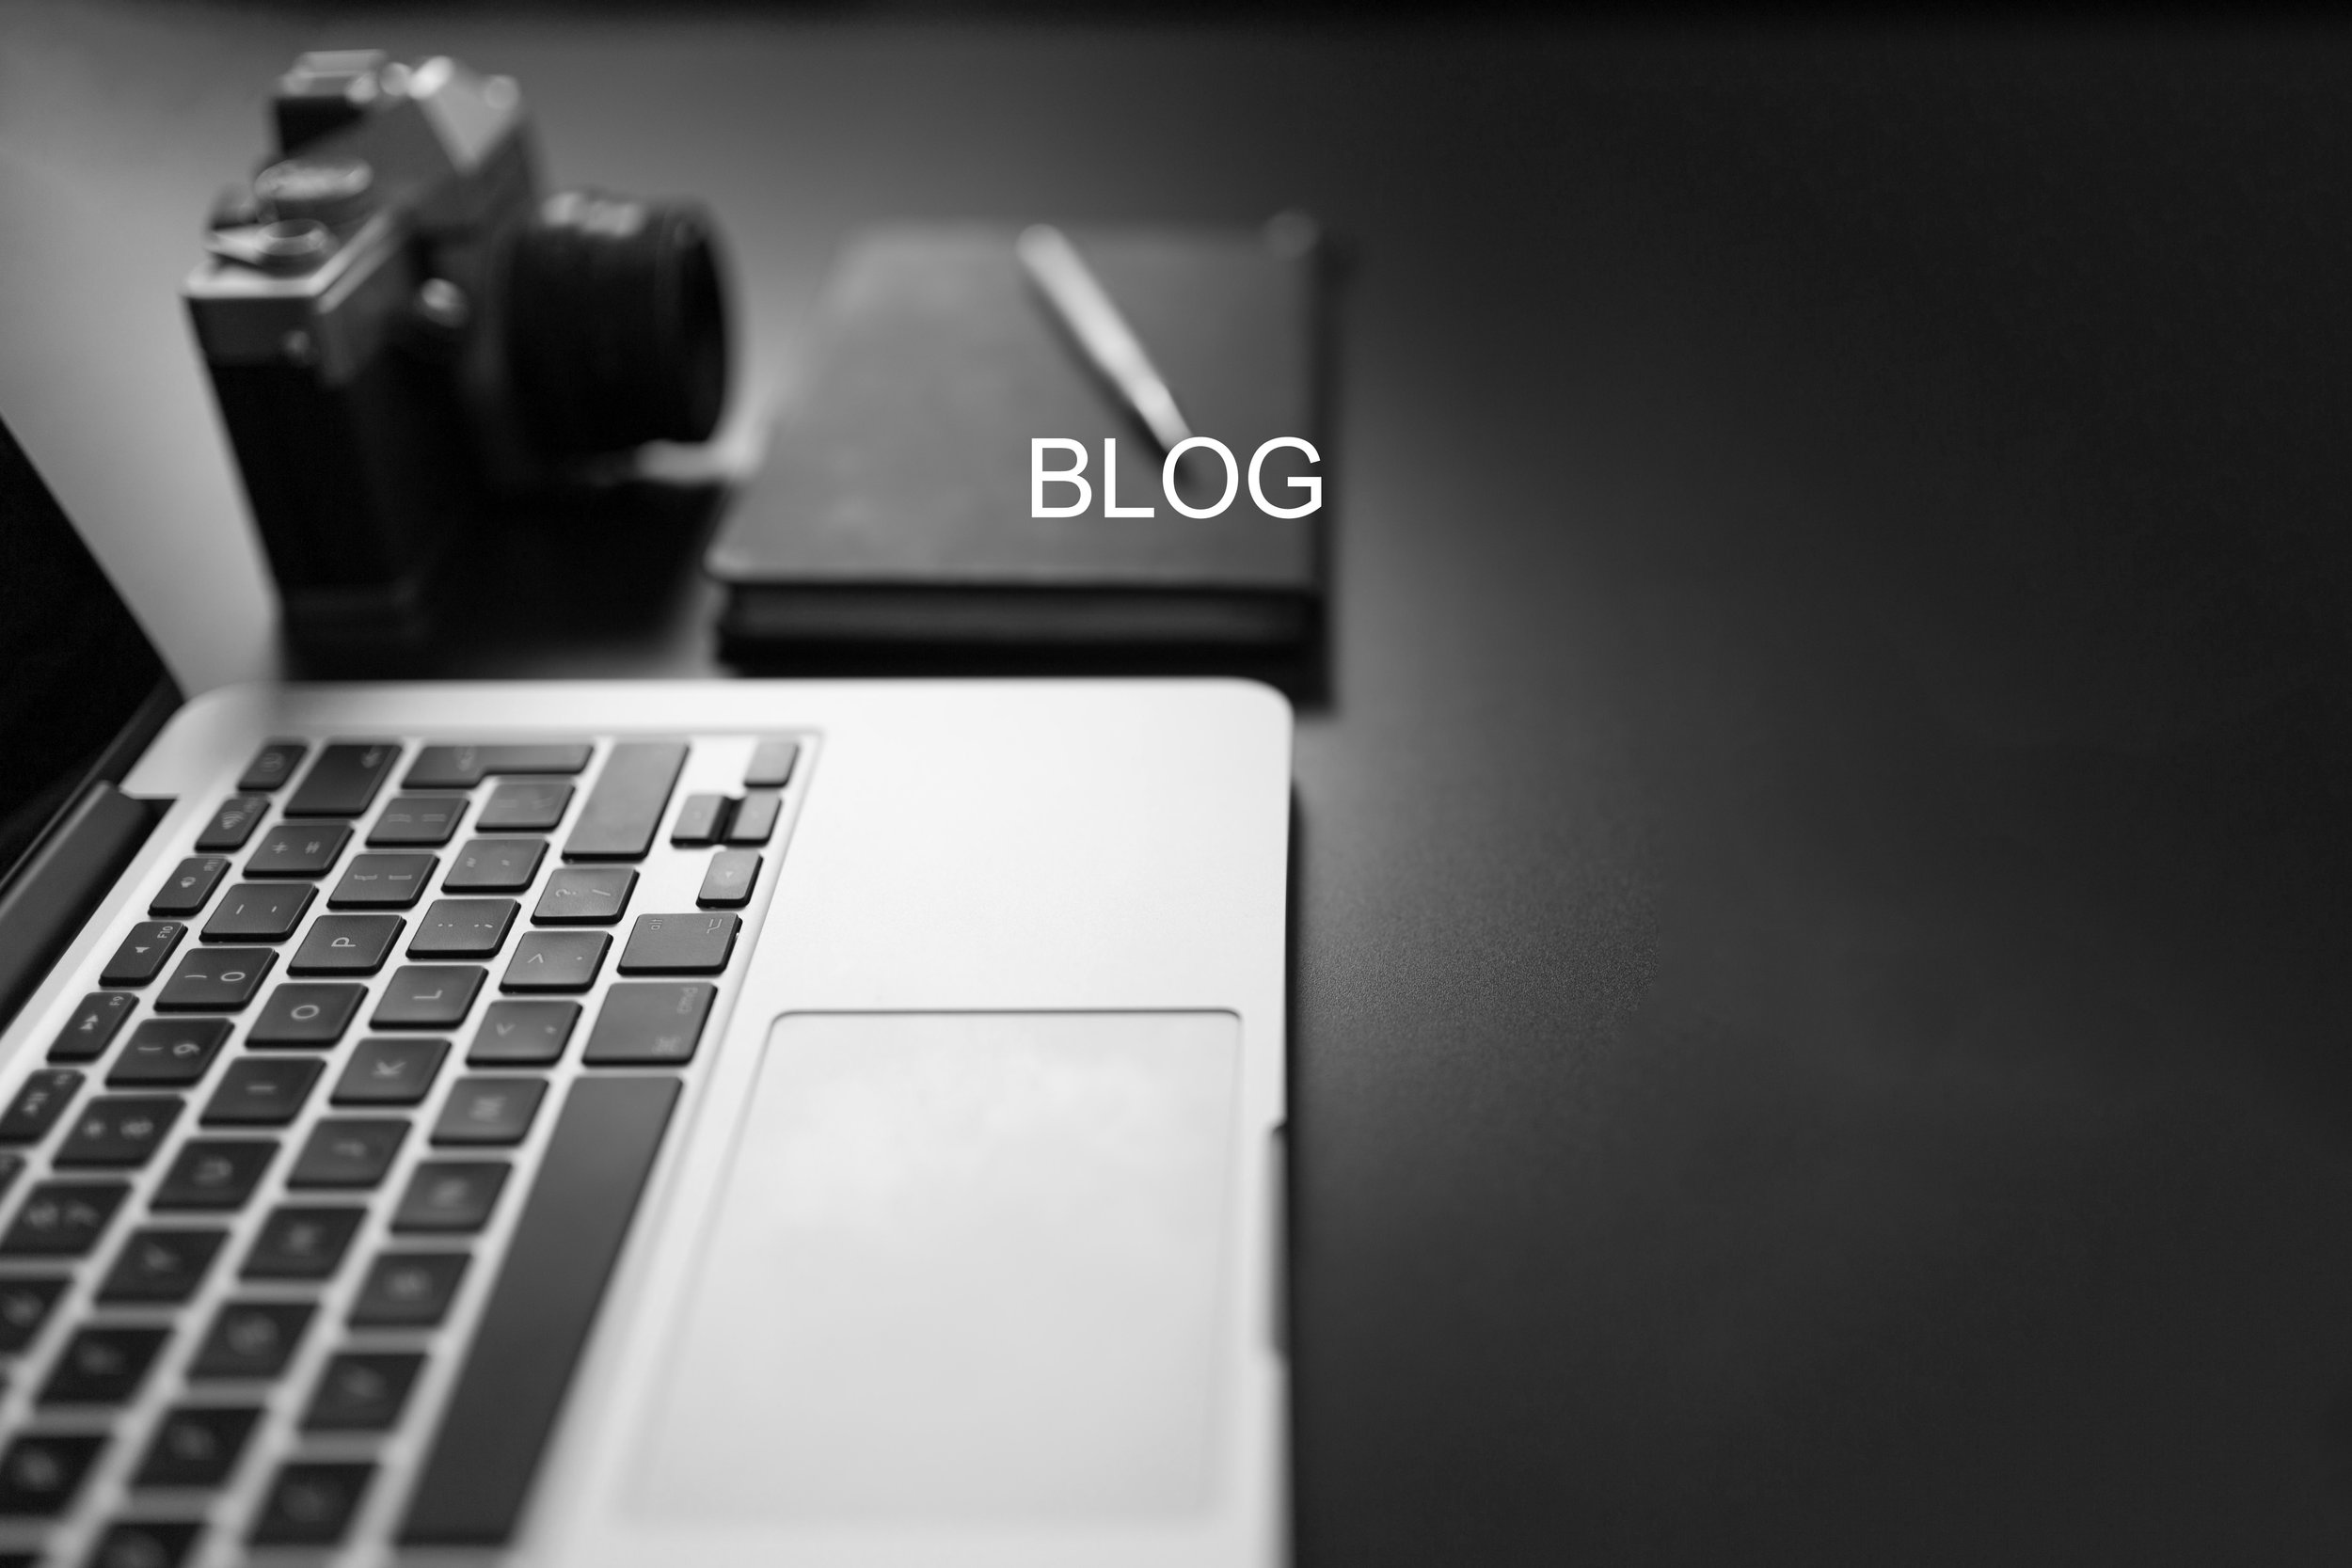 blog_head1-text.jpg